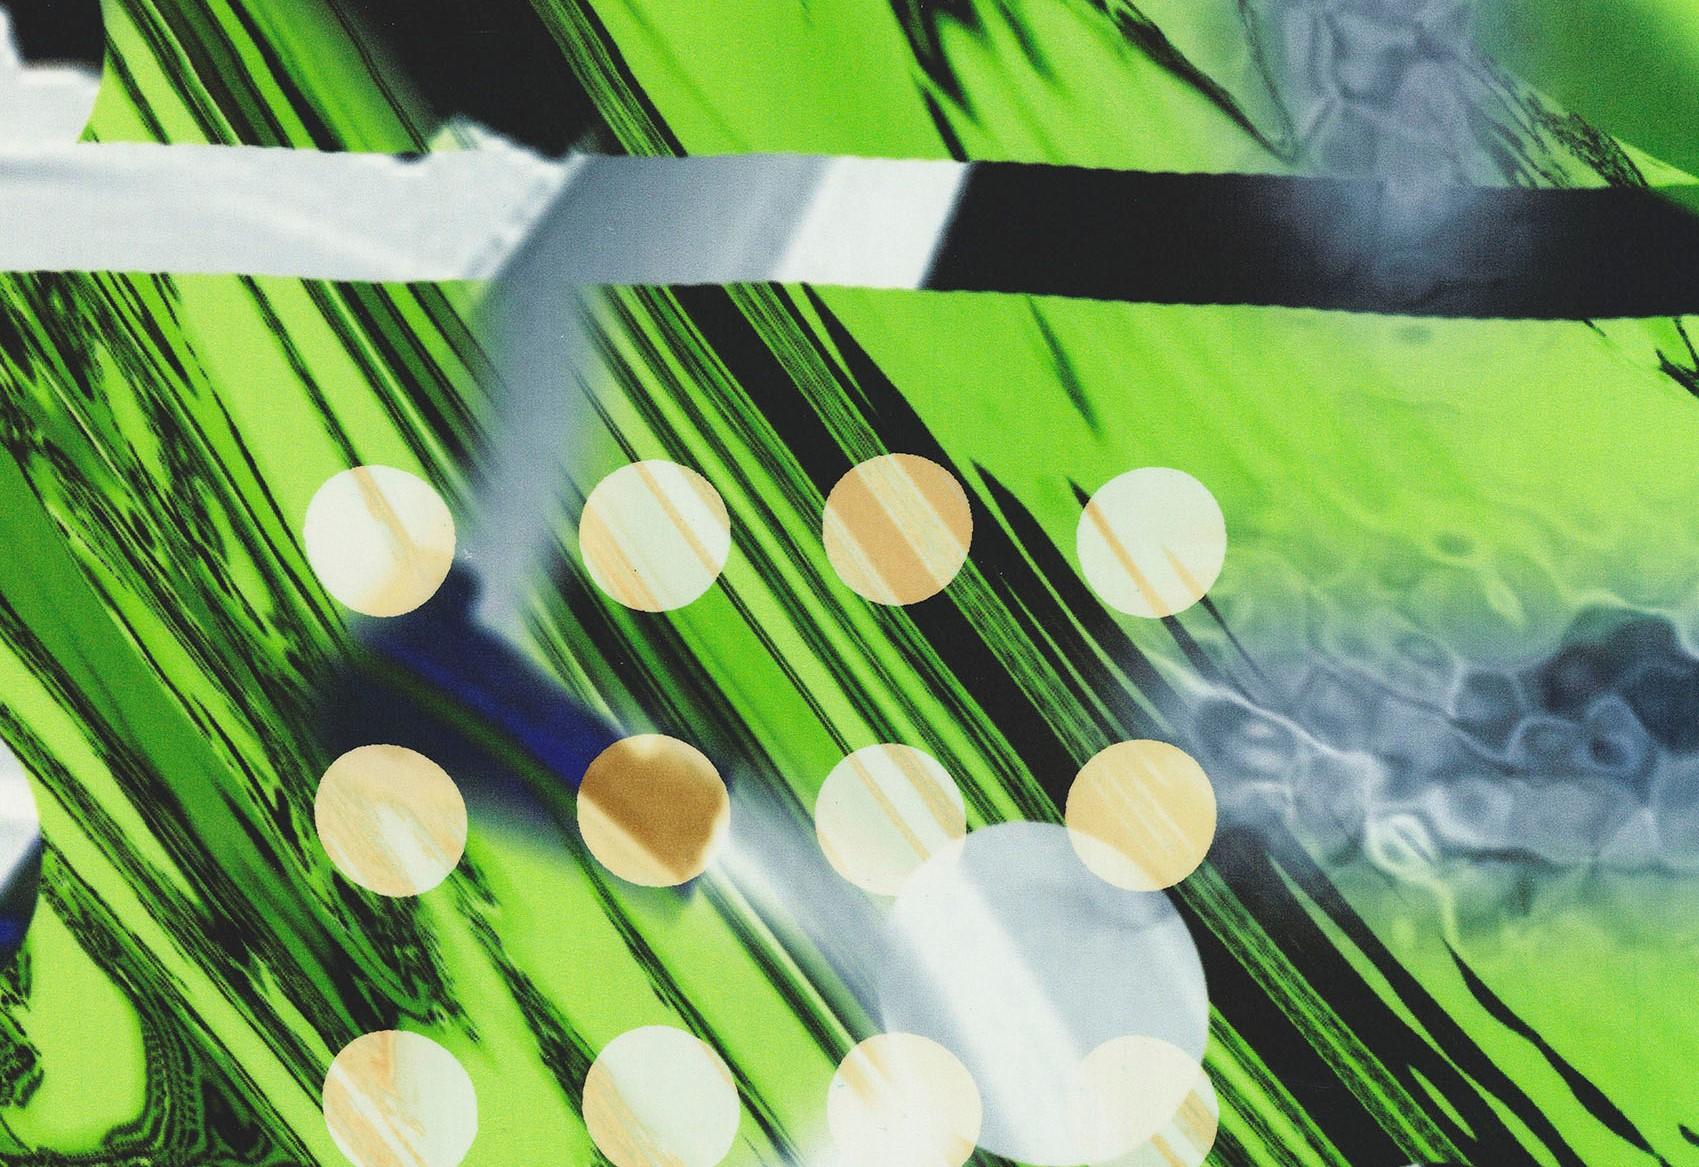 Emilie Carlsen,  Digital Realism - Green  (detail), 2015. Digital and analog printing on silk satin in steel frame.